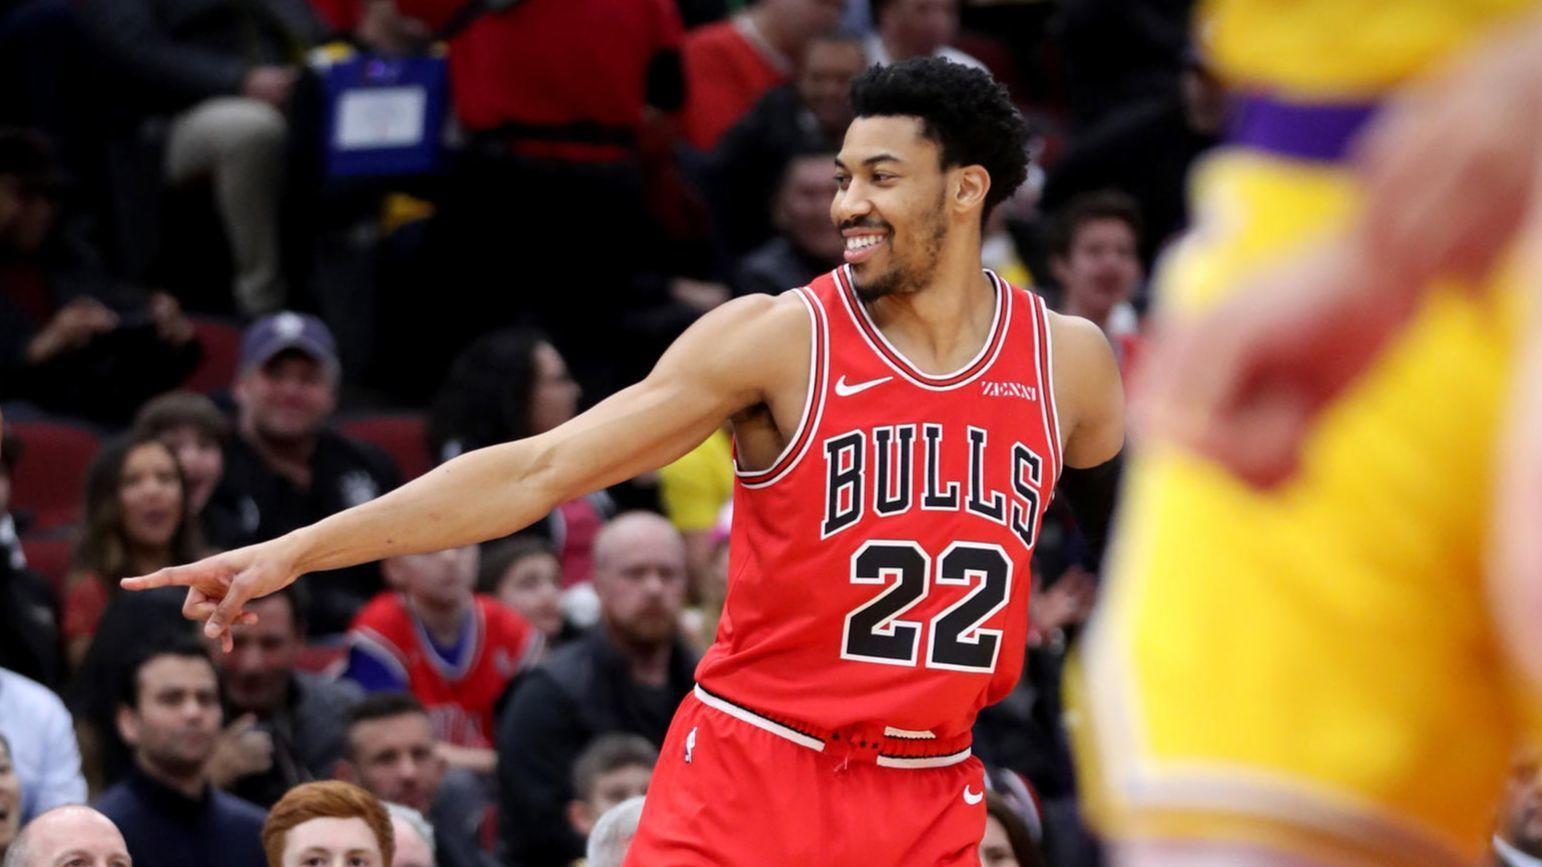 Otto Porter Jr. vows to return from right shoulder injury despite Bulls' lost season